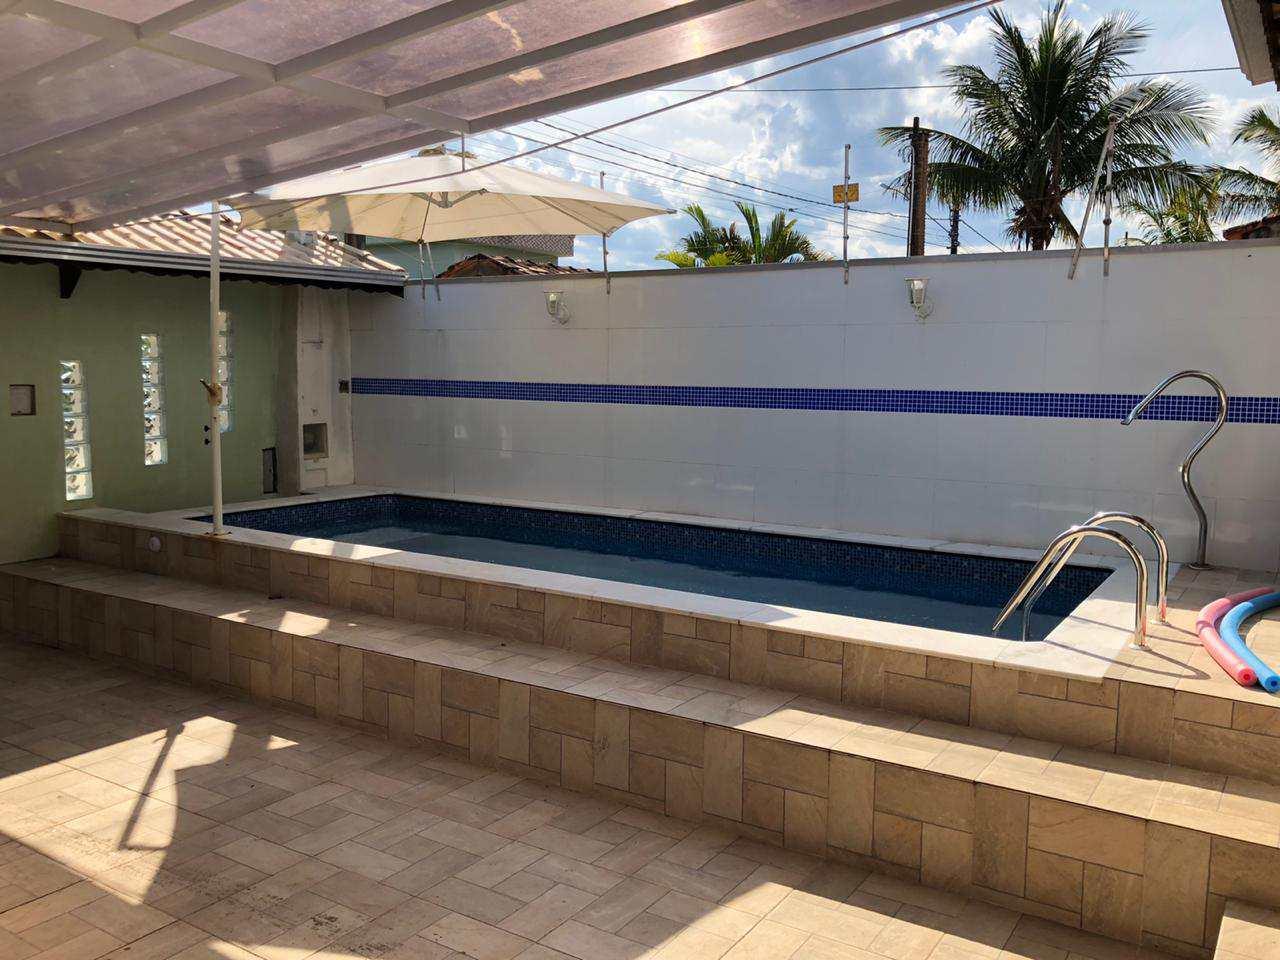 Casa com 2 dorms, Jardim Grandesp, Itanhaém - R$ 269 mil, Cod: 194